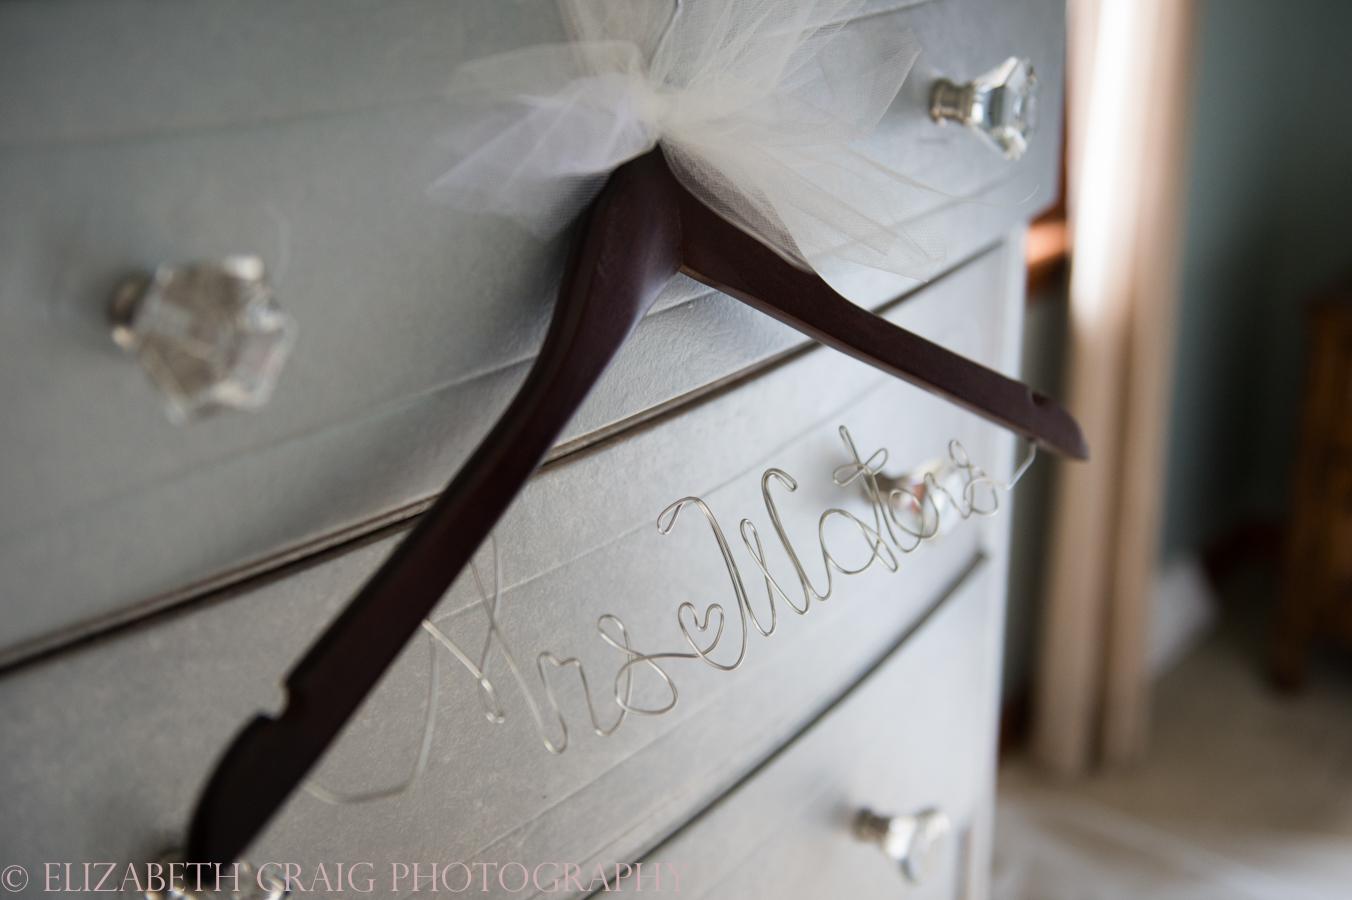 pittsburgh-greek-weddings-fairmont-weddings-receptions-elizabeth-craig-photohgraphy-002